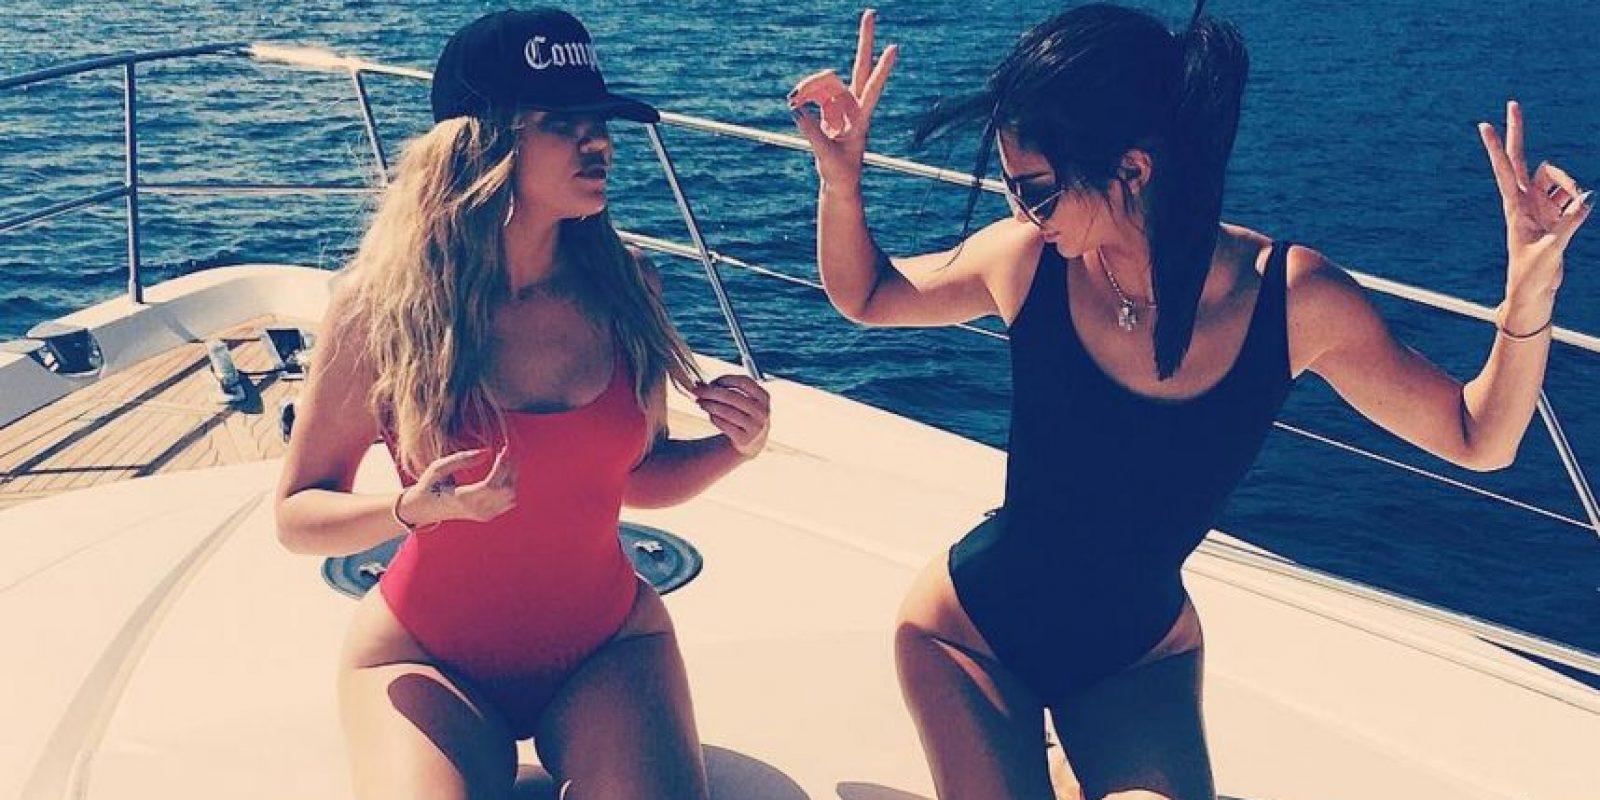 Khloé Kardashian y Kendall Jenner Foto:Vía /instagram.com/khloekardashian/